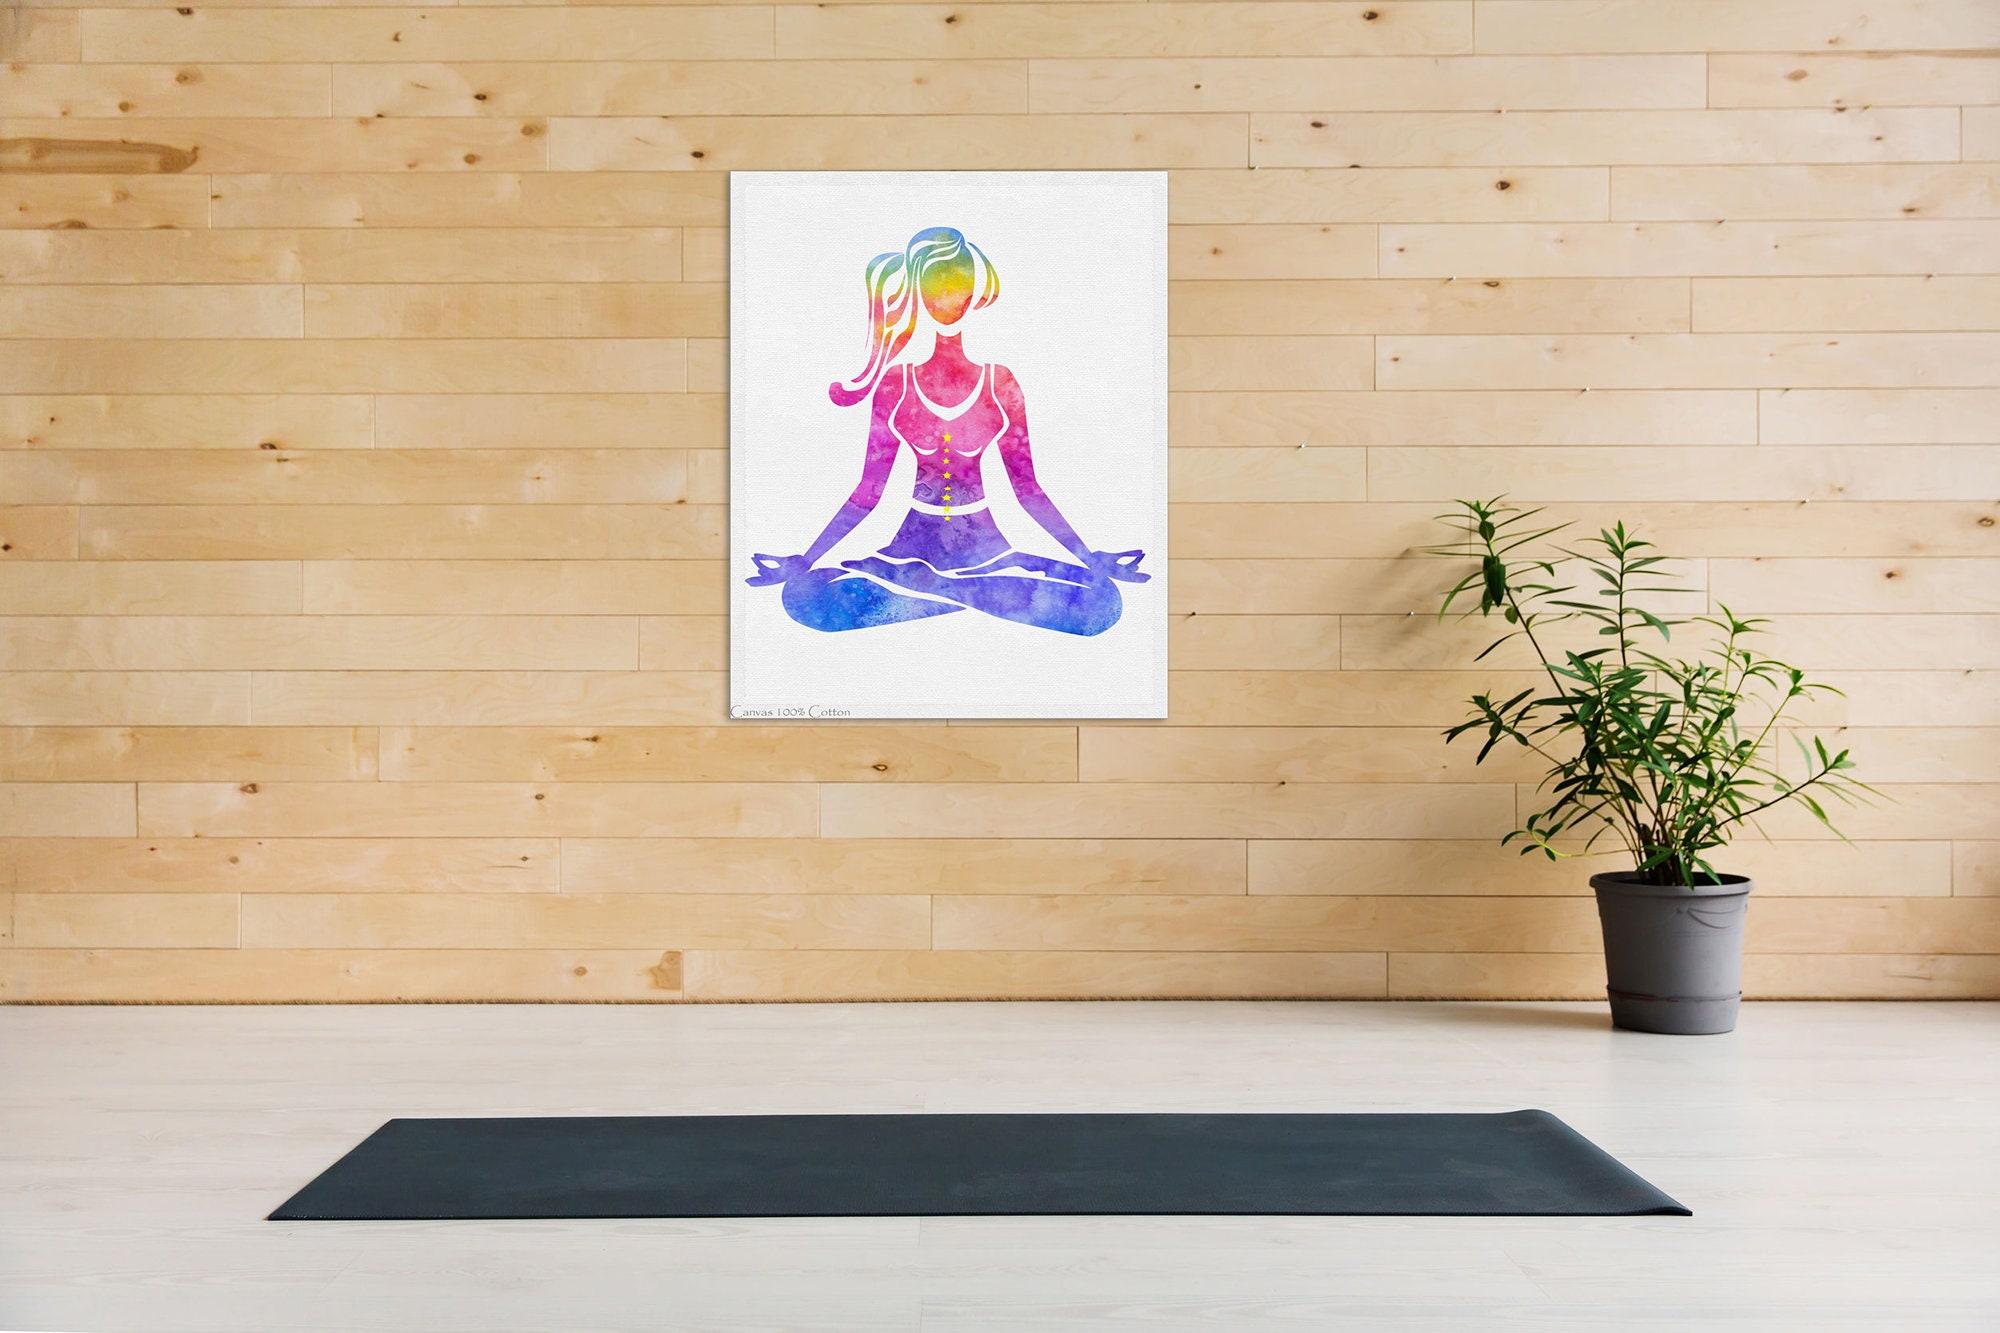 Yoga Print Yoga Art Lotus Pose Yoga Watercolor Art Meditation Gift Bedroom Decor Yoga Painting Yoga Studio Decor Gift Yoga Lover